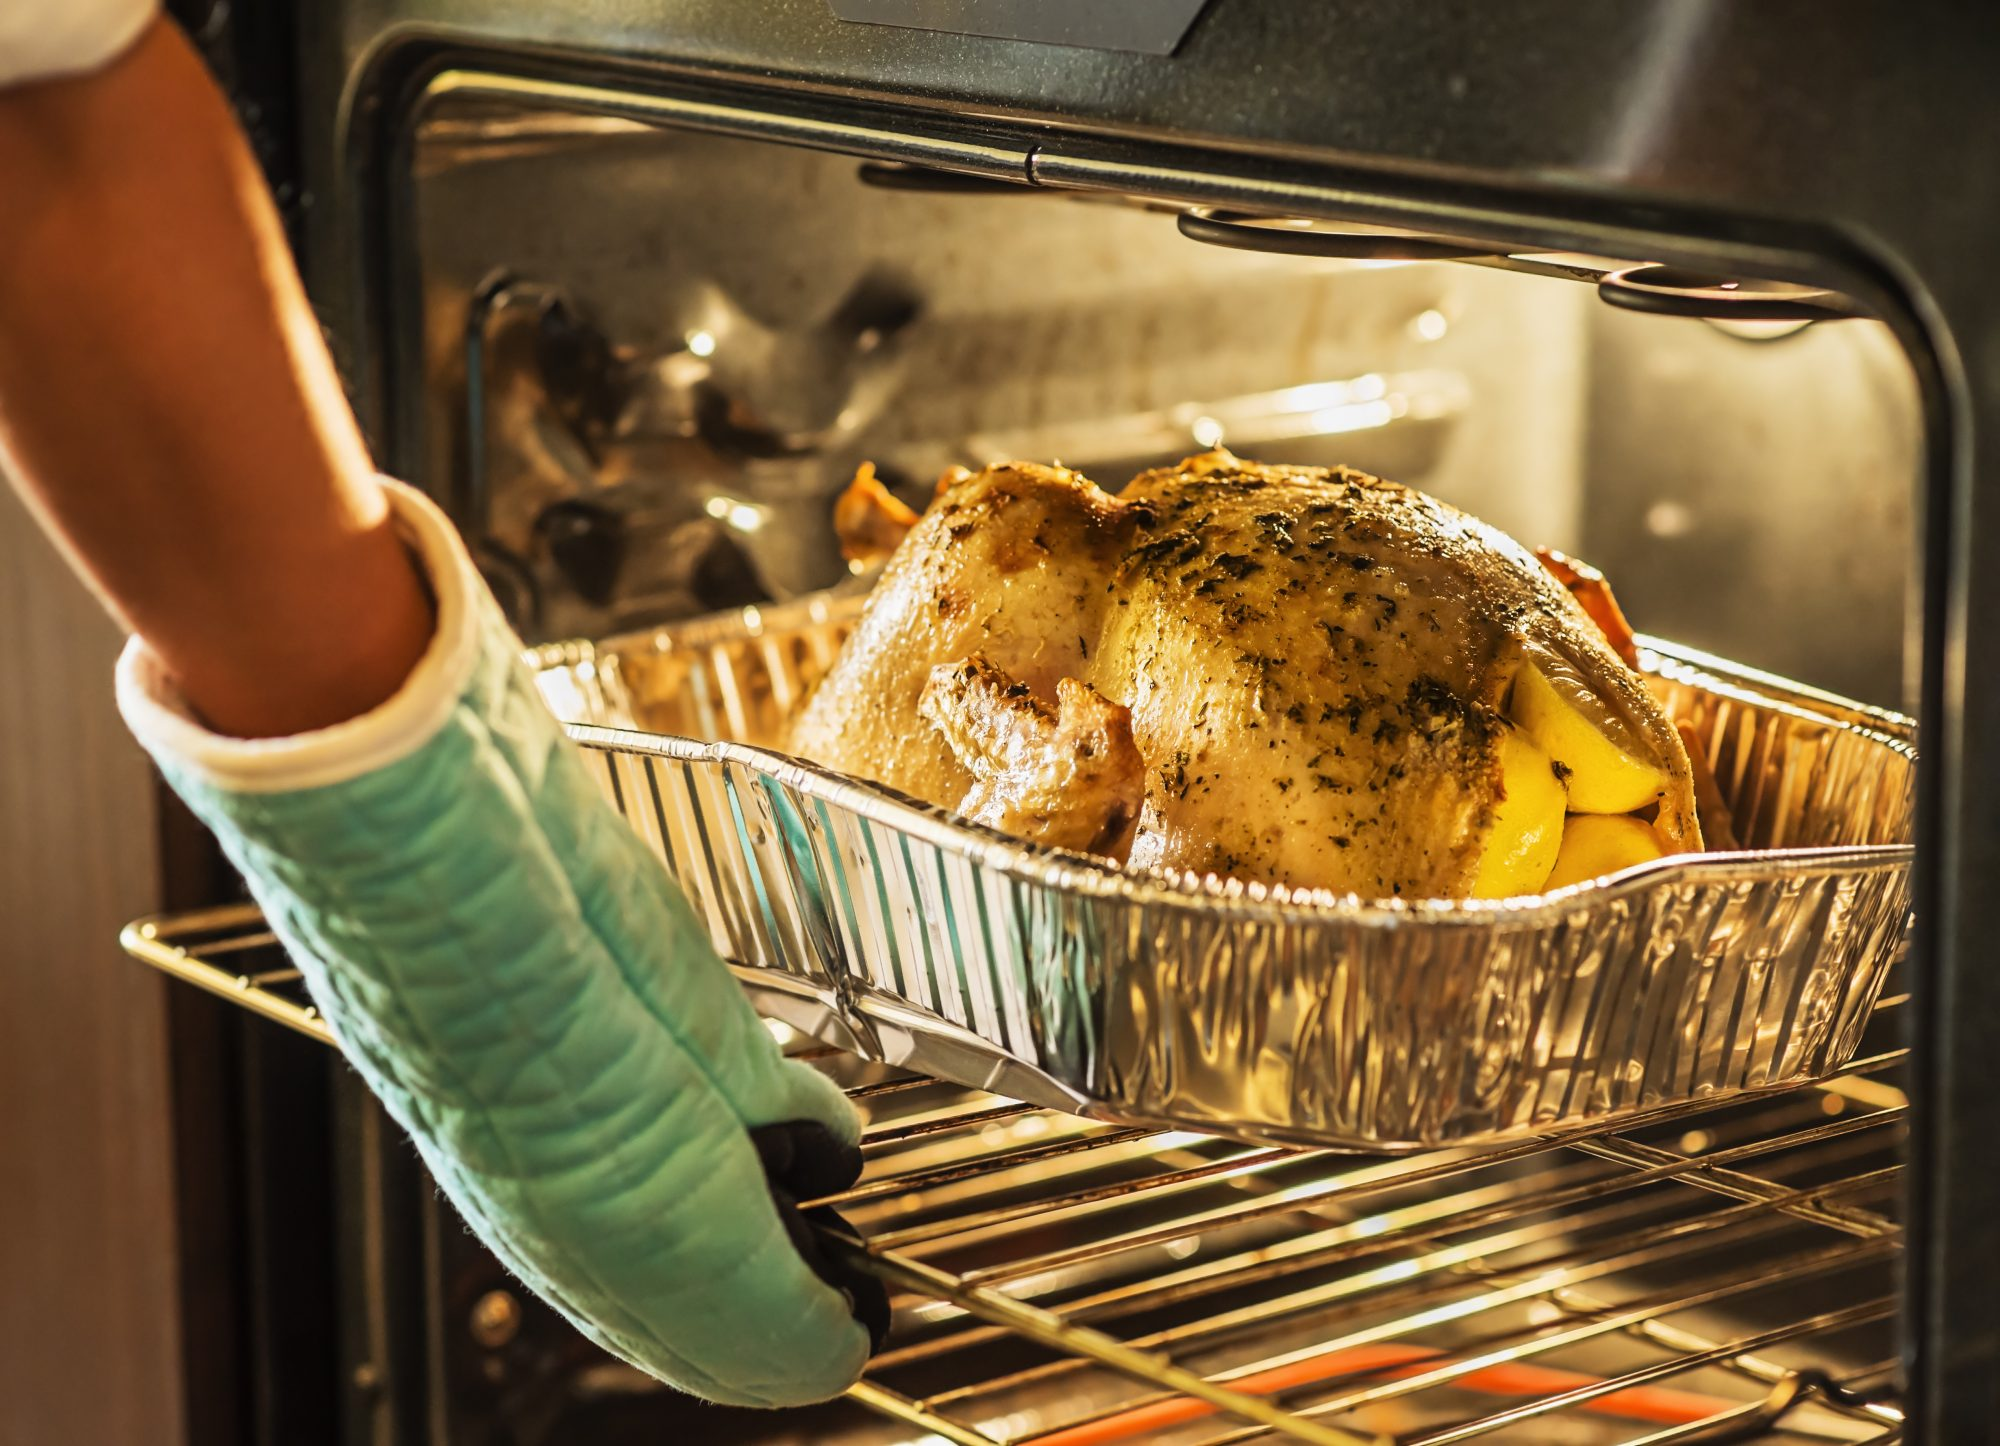 turkey in oven getty 7/20/20